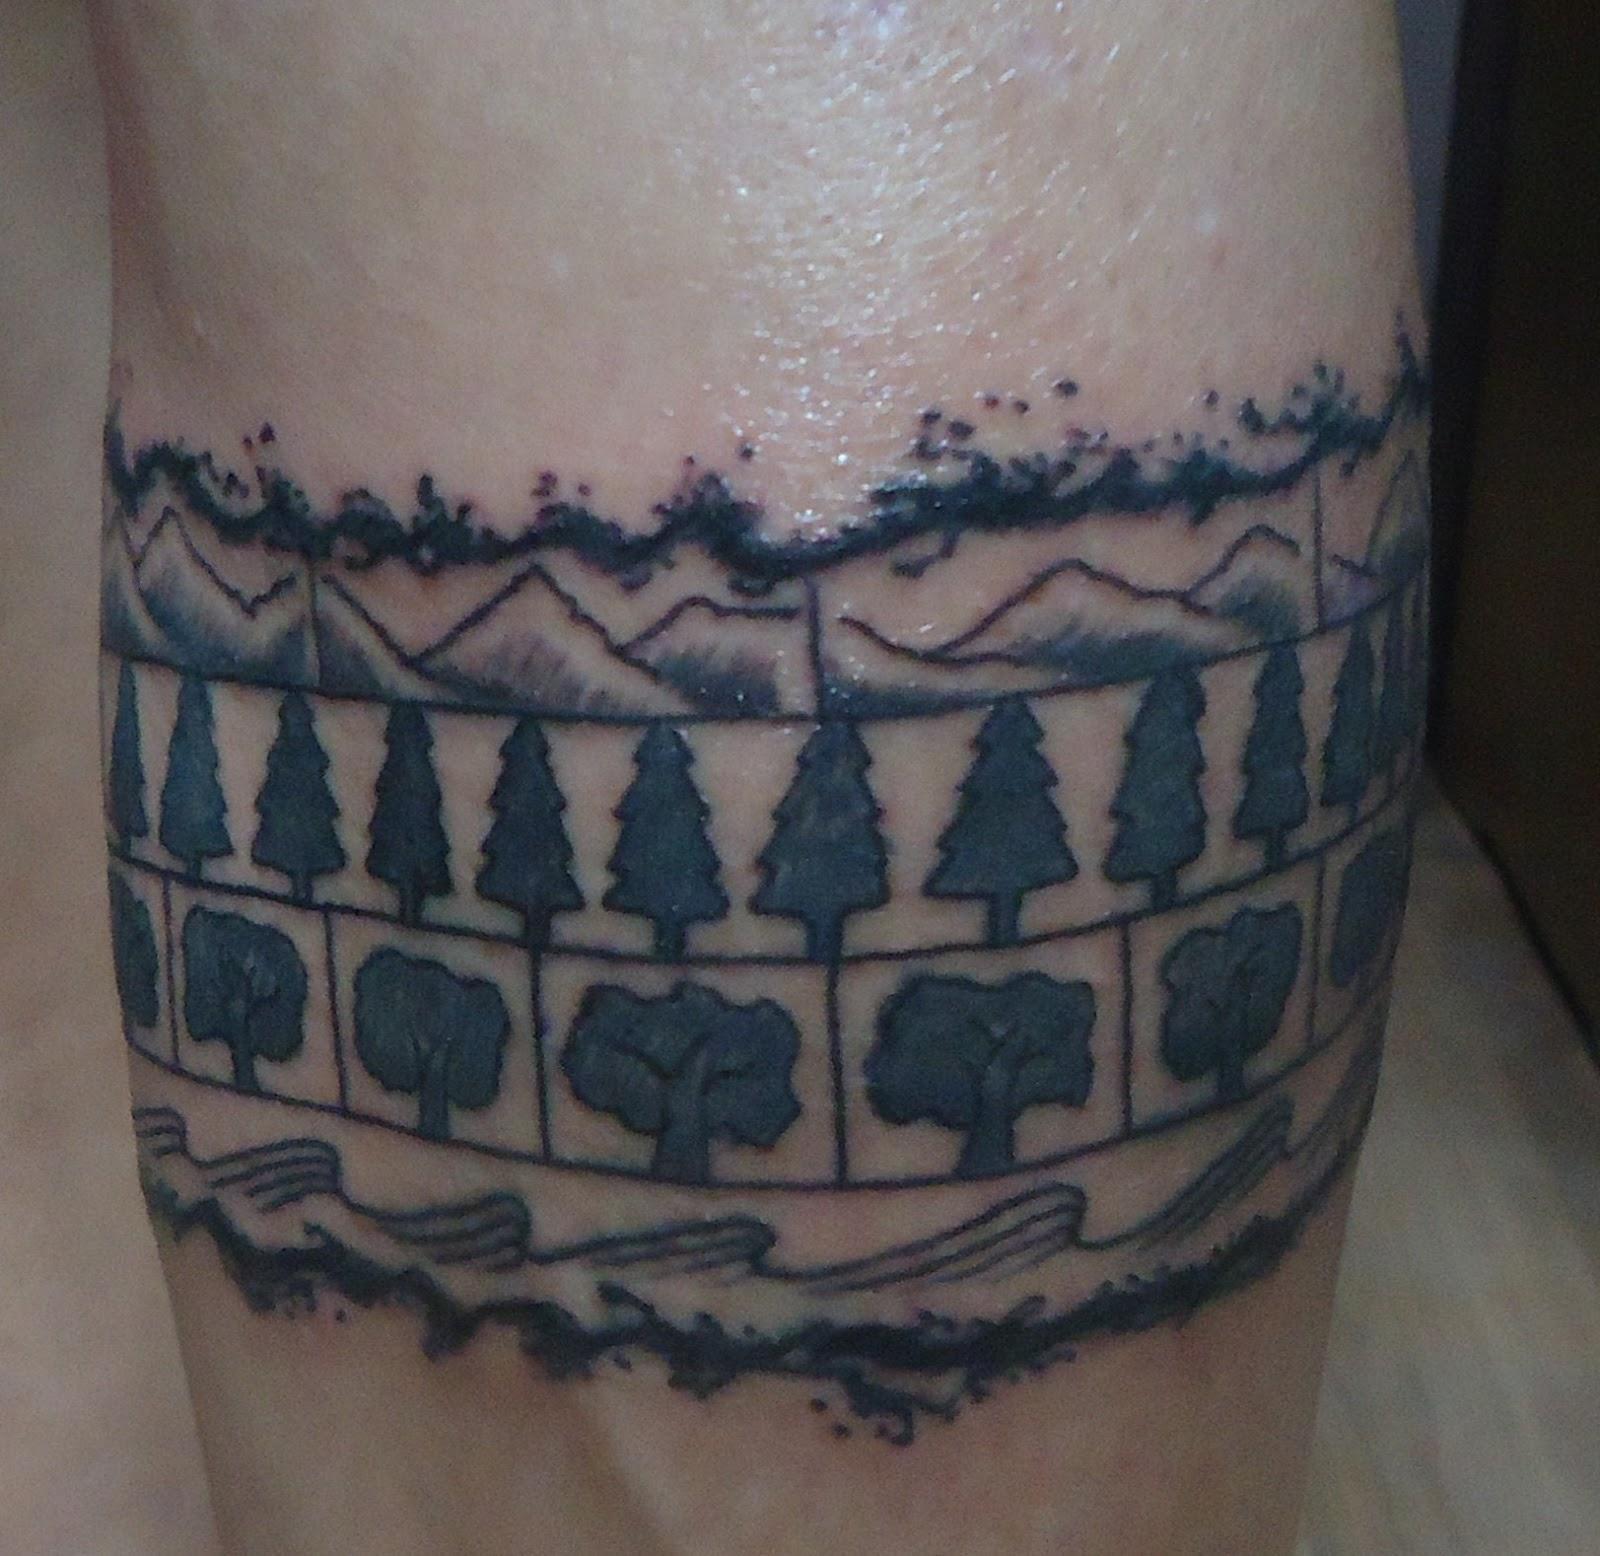 Best Tattoo In Kathmandu And Pokhara Nepal: Funky Buddha Tattoo: Thamel, Kathmandu: July 2012